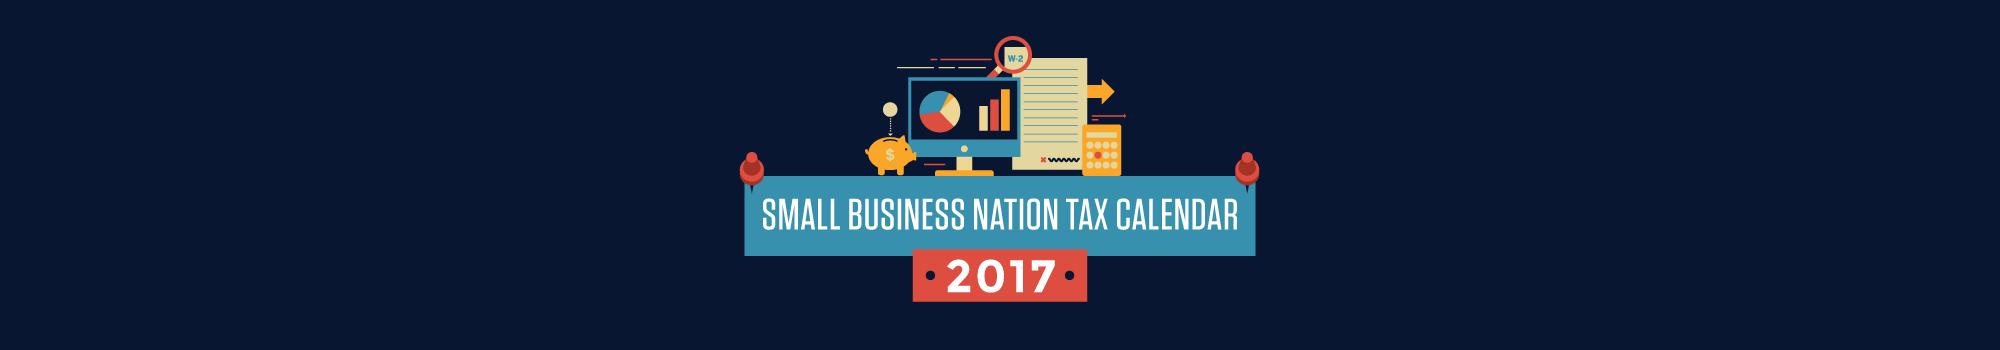 SBN_TaxCal_2017_v2.png